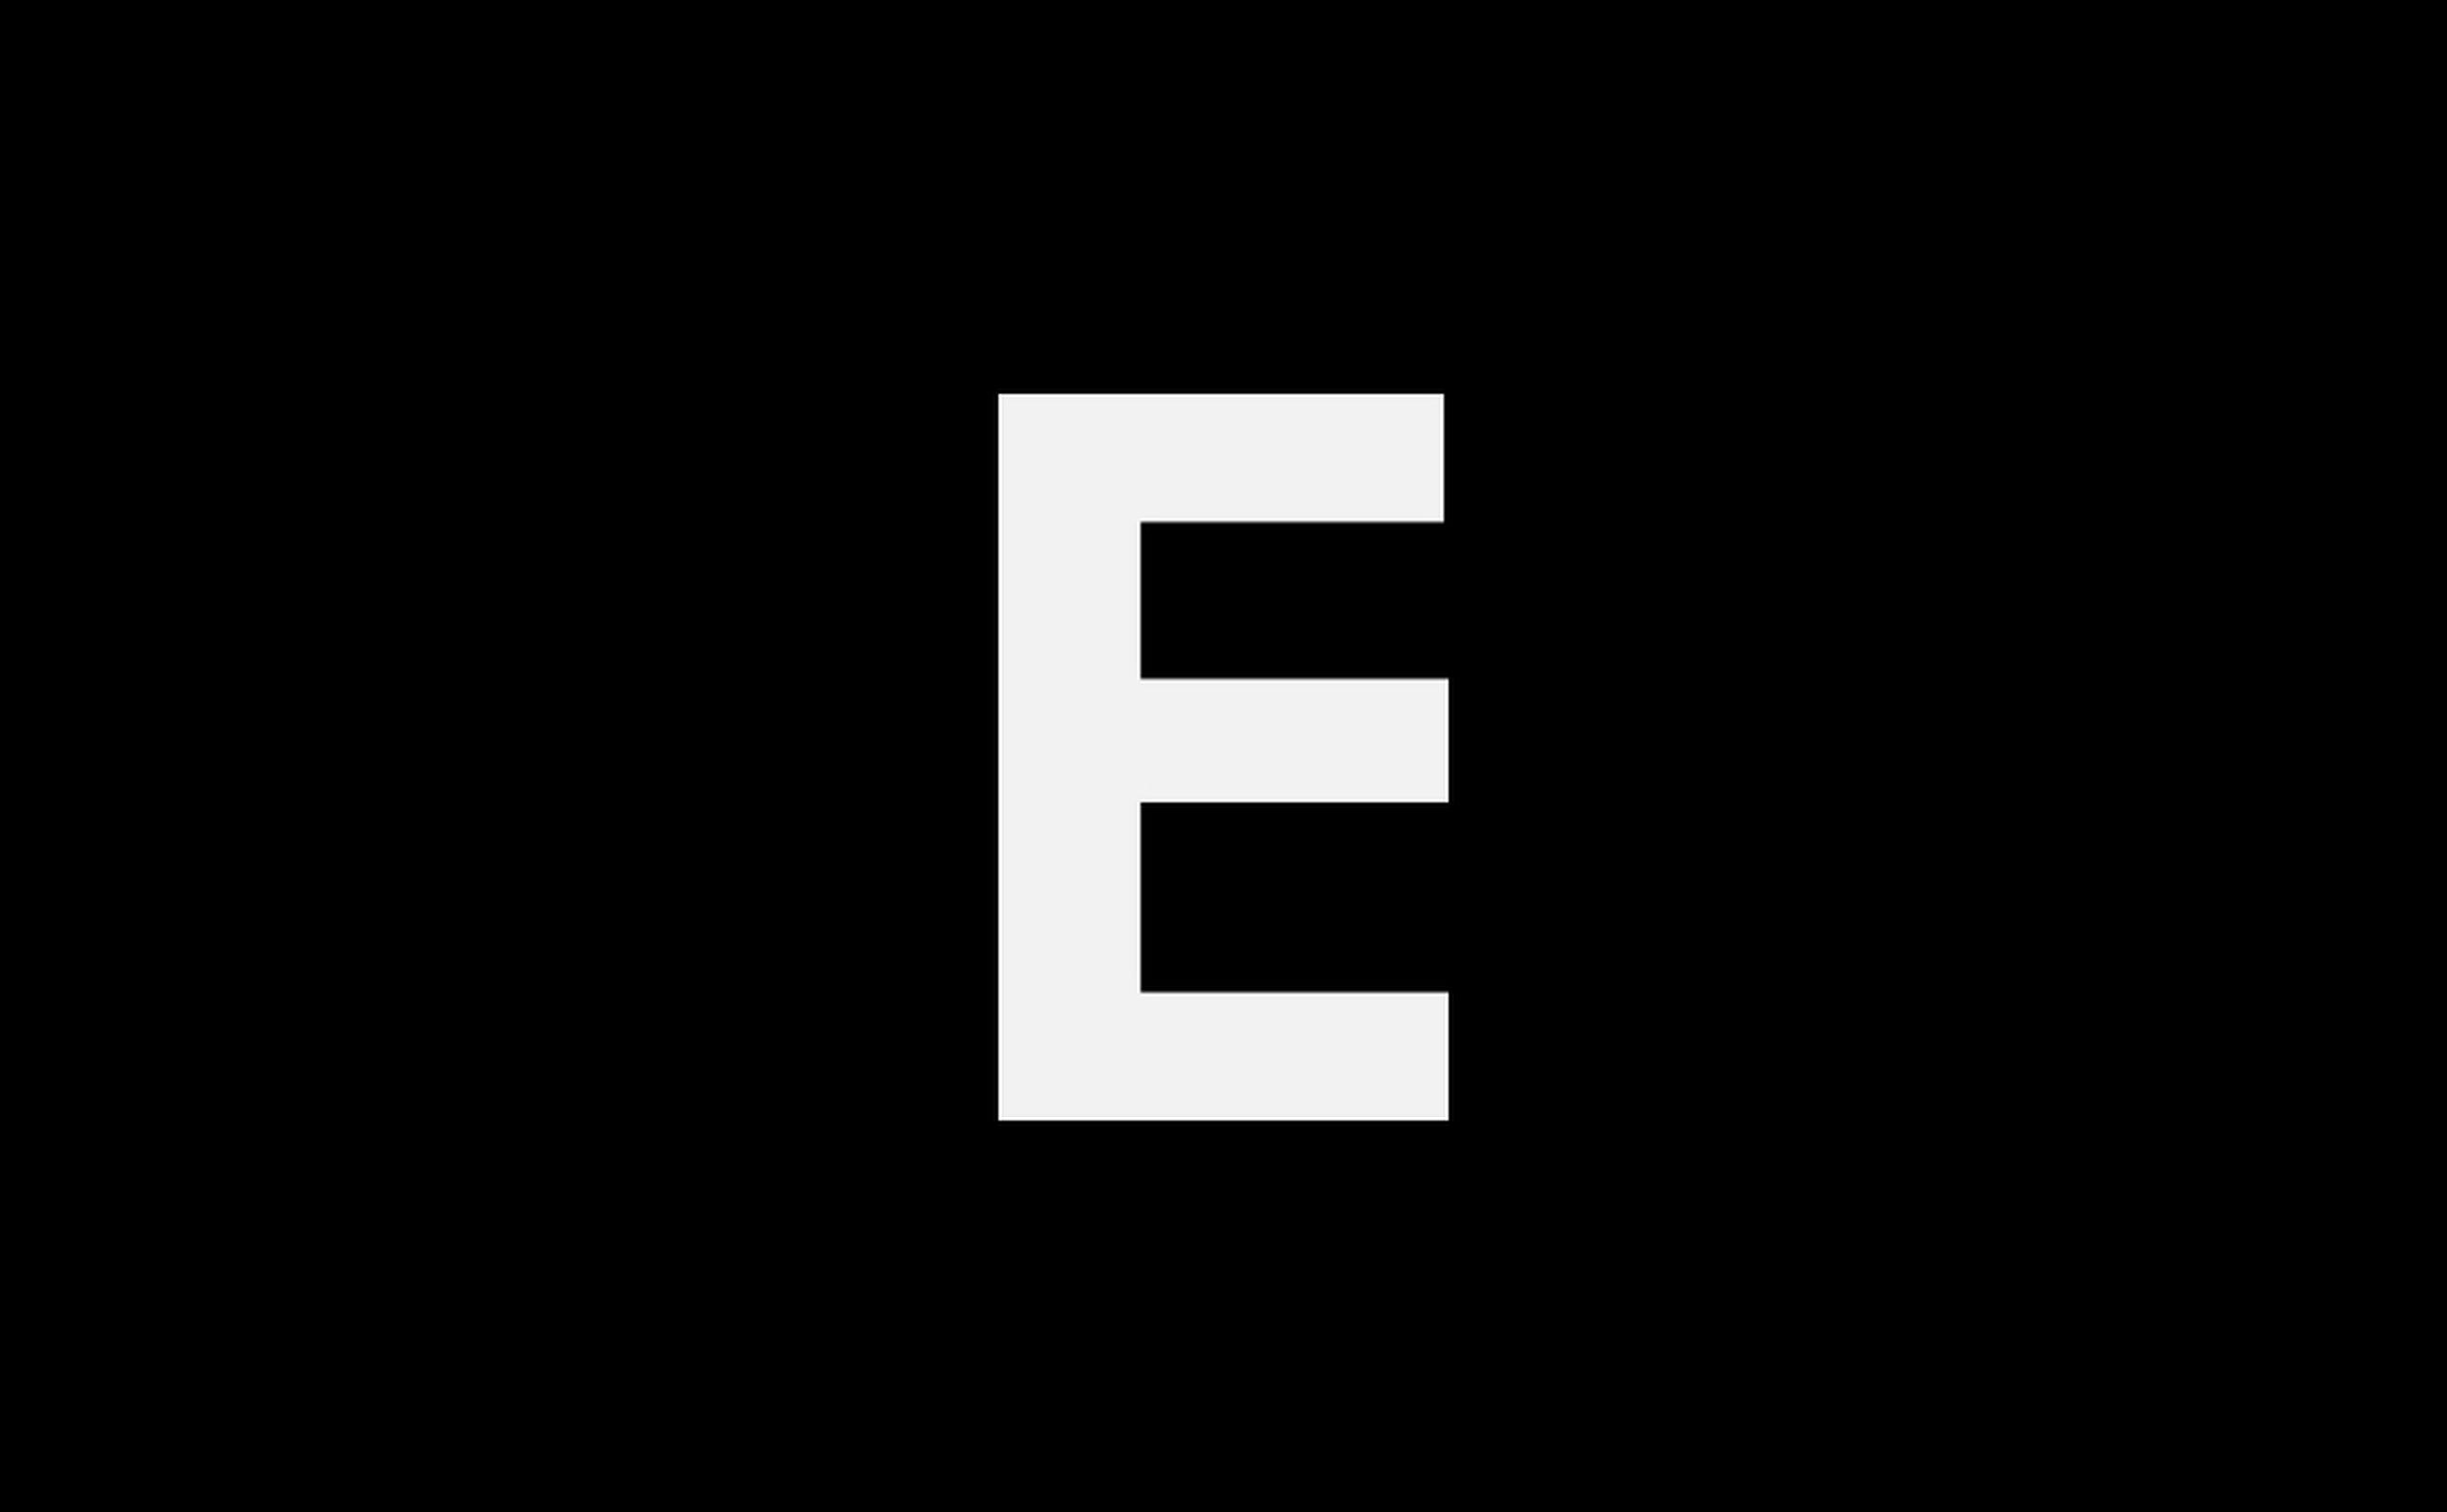 CLOSED DOOR ON OLD BUILDING